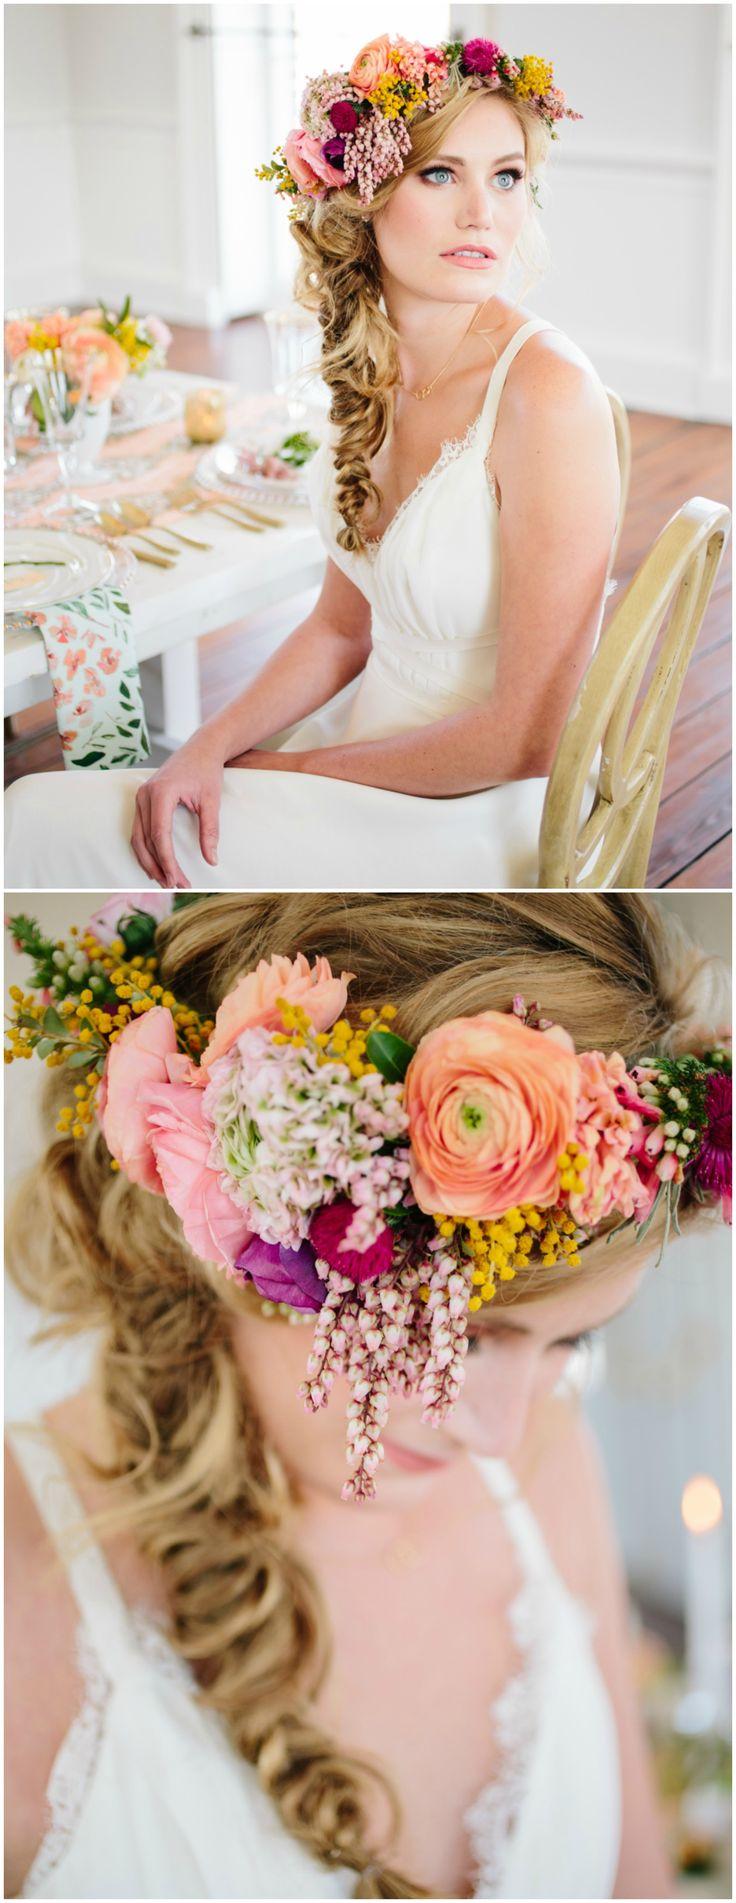 Bridal flower crown, colorful flowers, fishtail braid, wedding hair ideas // Riverland Studios